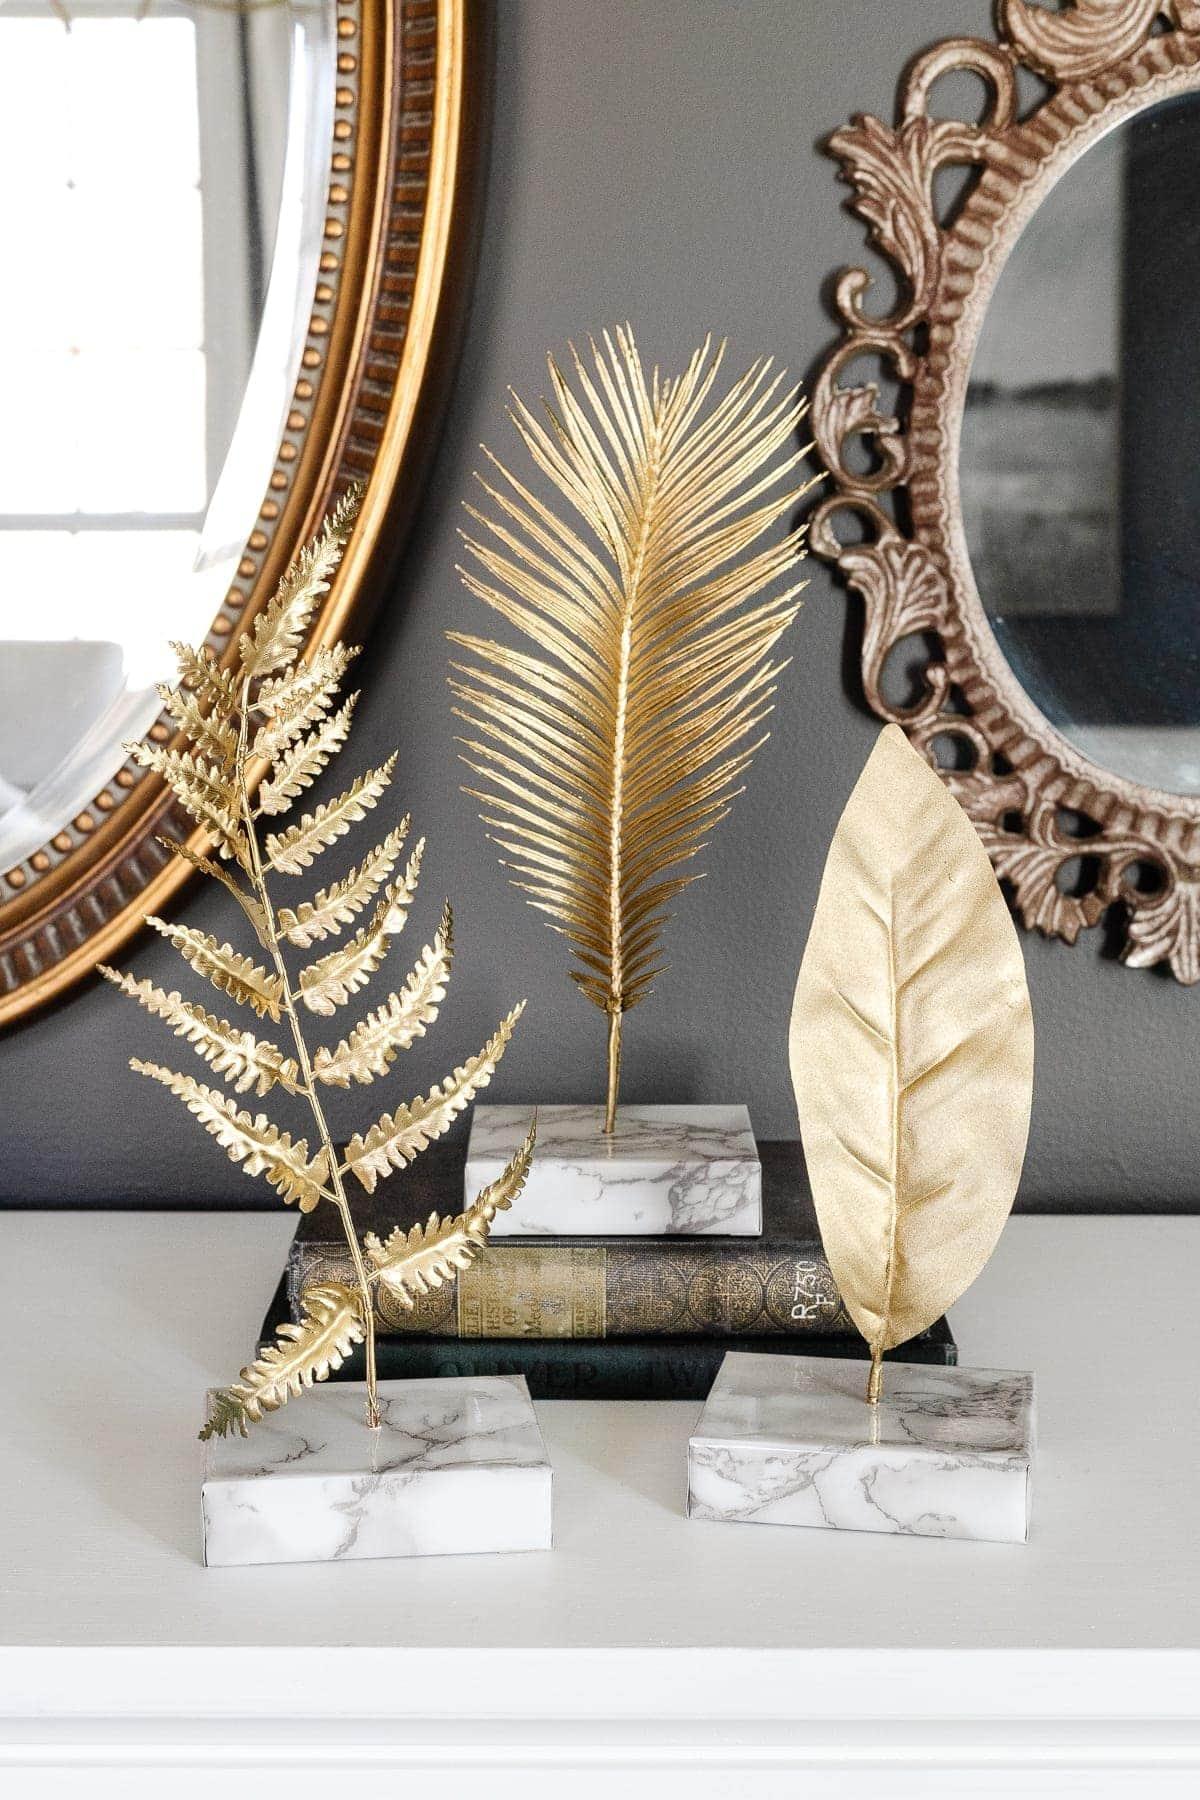 DIY Gold Leaf Sculpture in Faux Marble Blocks